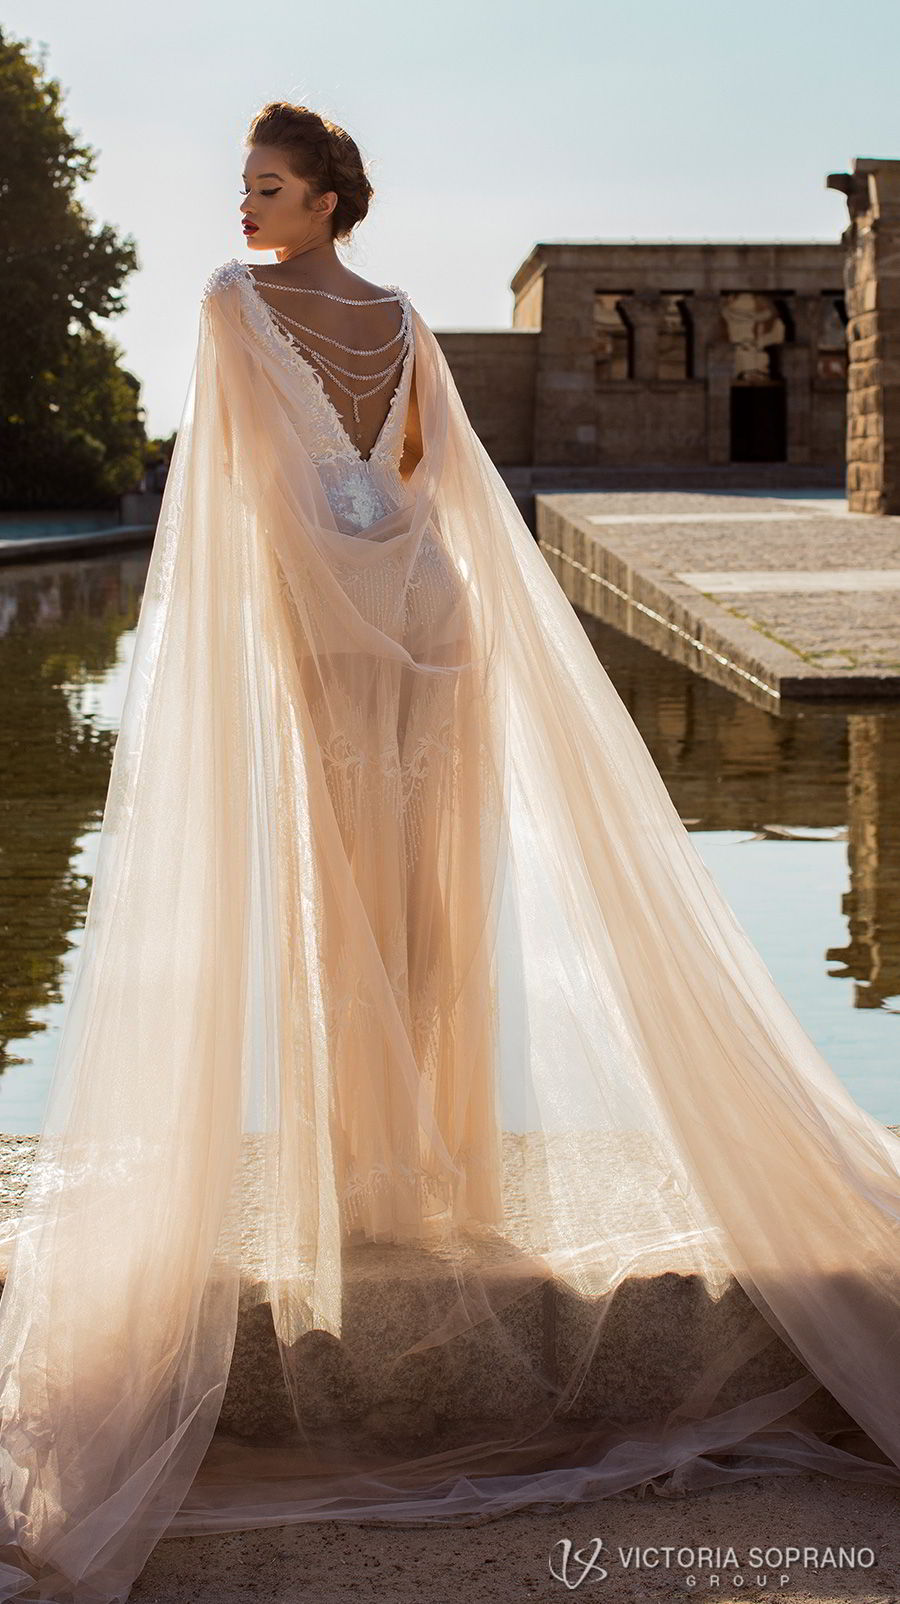 victoria soprano 2018 bridal cap sleeves bateau neckline full embellishment modern champagne color soft a line wedding dress v back chapel cape train (emma) bv